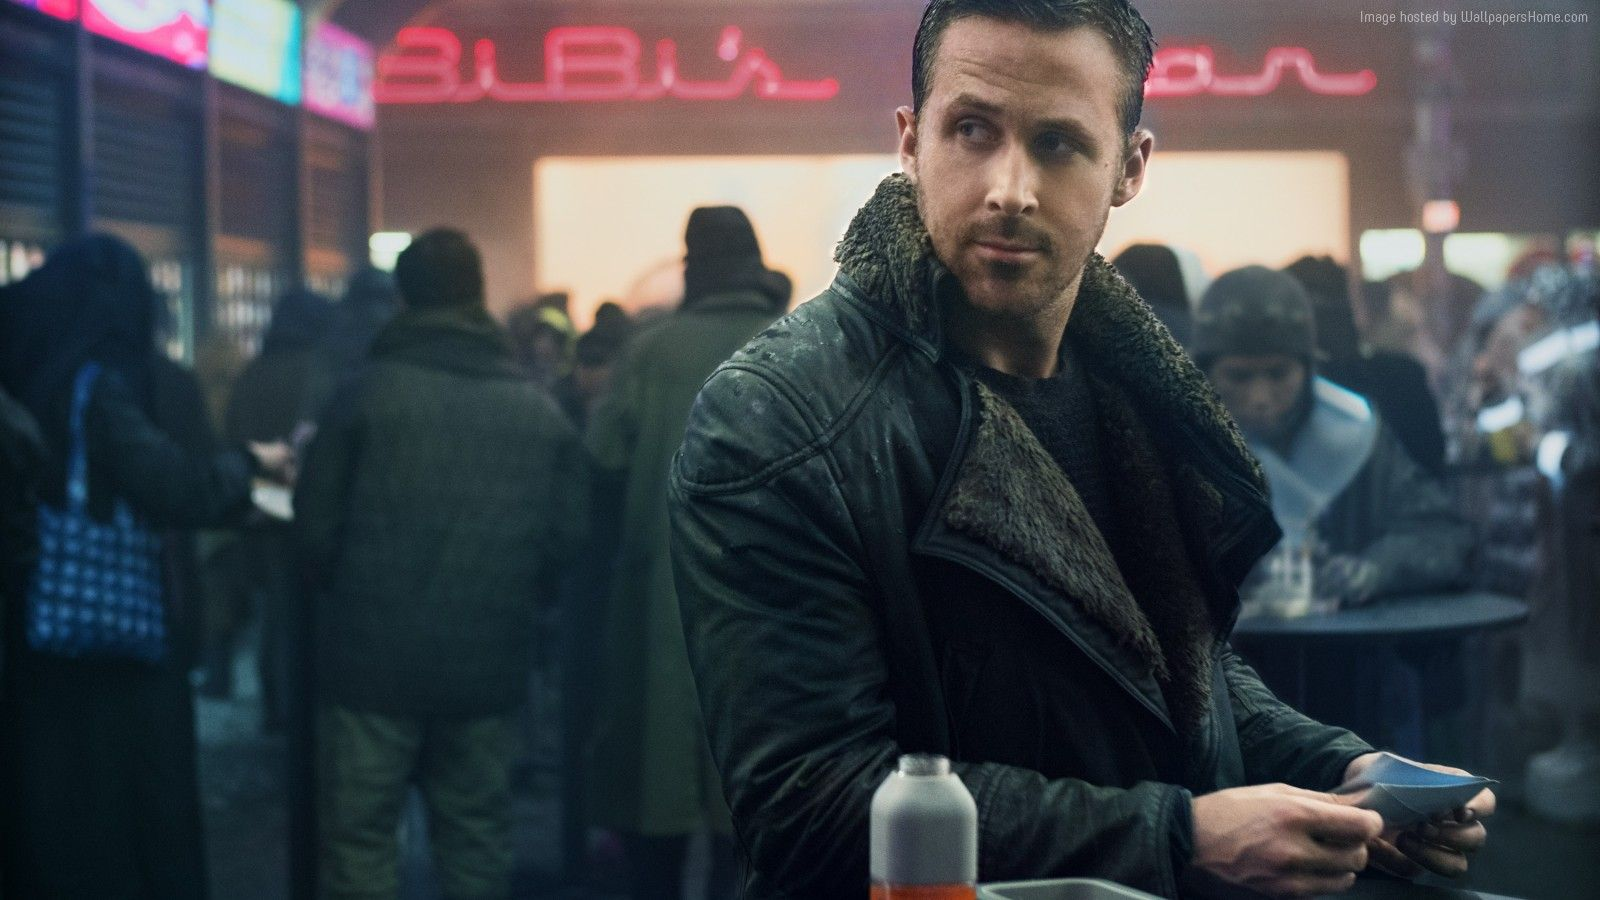 a6cbdc49a Awesome Blade Runner 2049 | AmazingPict.com - Wallpapers | Blade ...